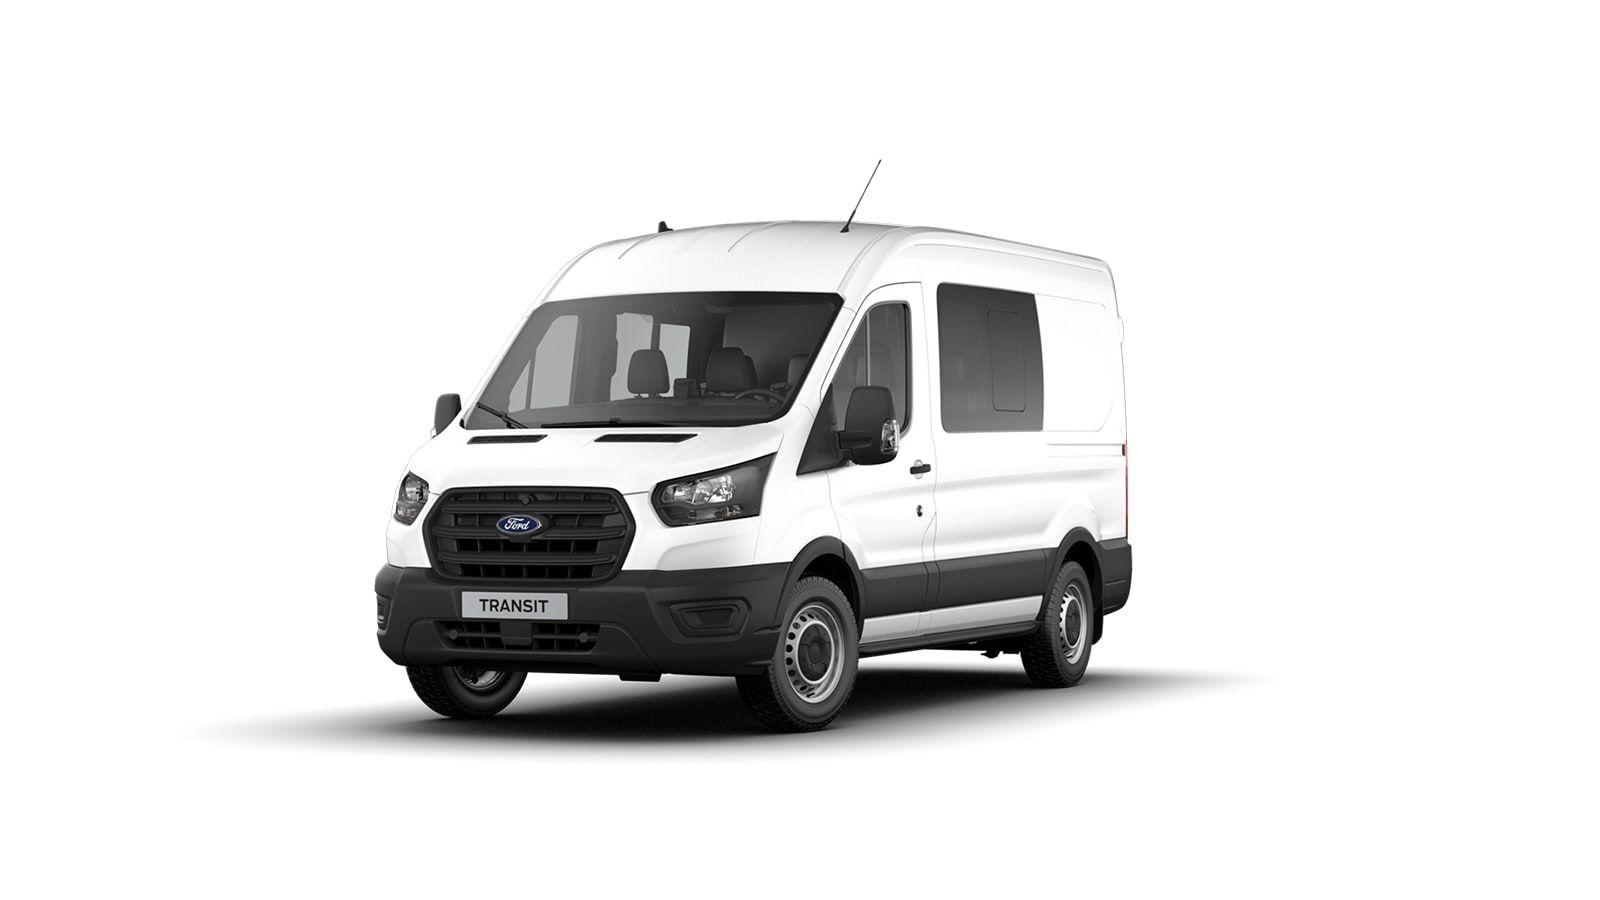 Nieuw Ford Transit 2t mca 350L Minibus L3 Trend mHEVM6 2.0 TD 130 pk M1 Euro 6.2 AXW - niet-metaalkleur: Frozen White 1